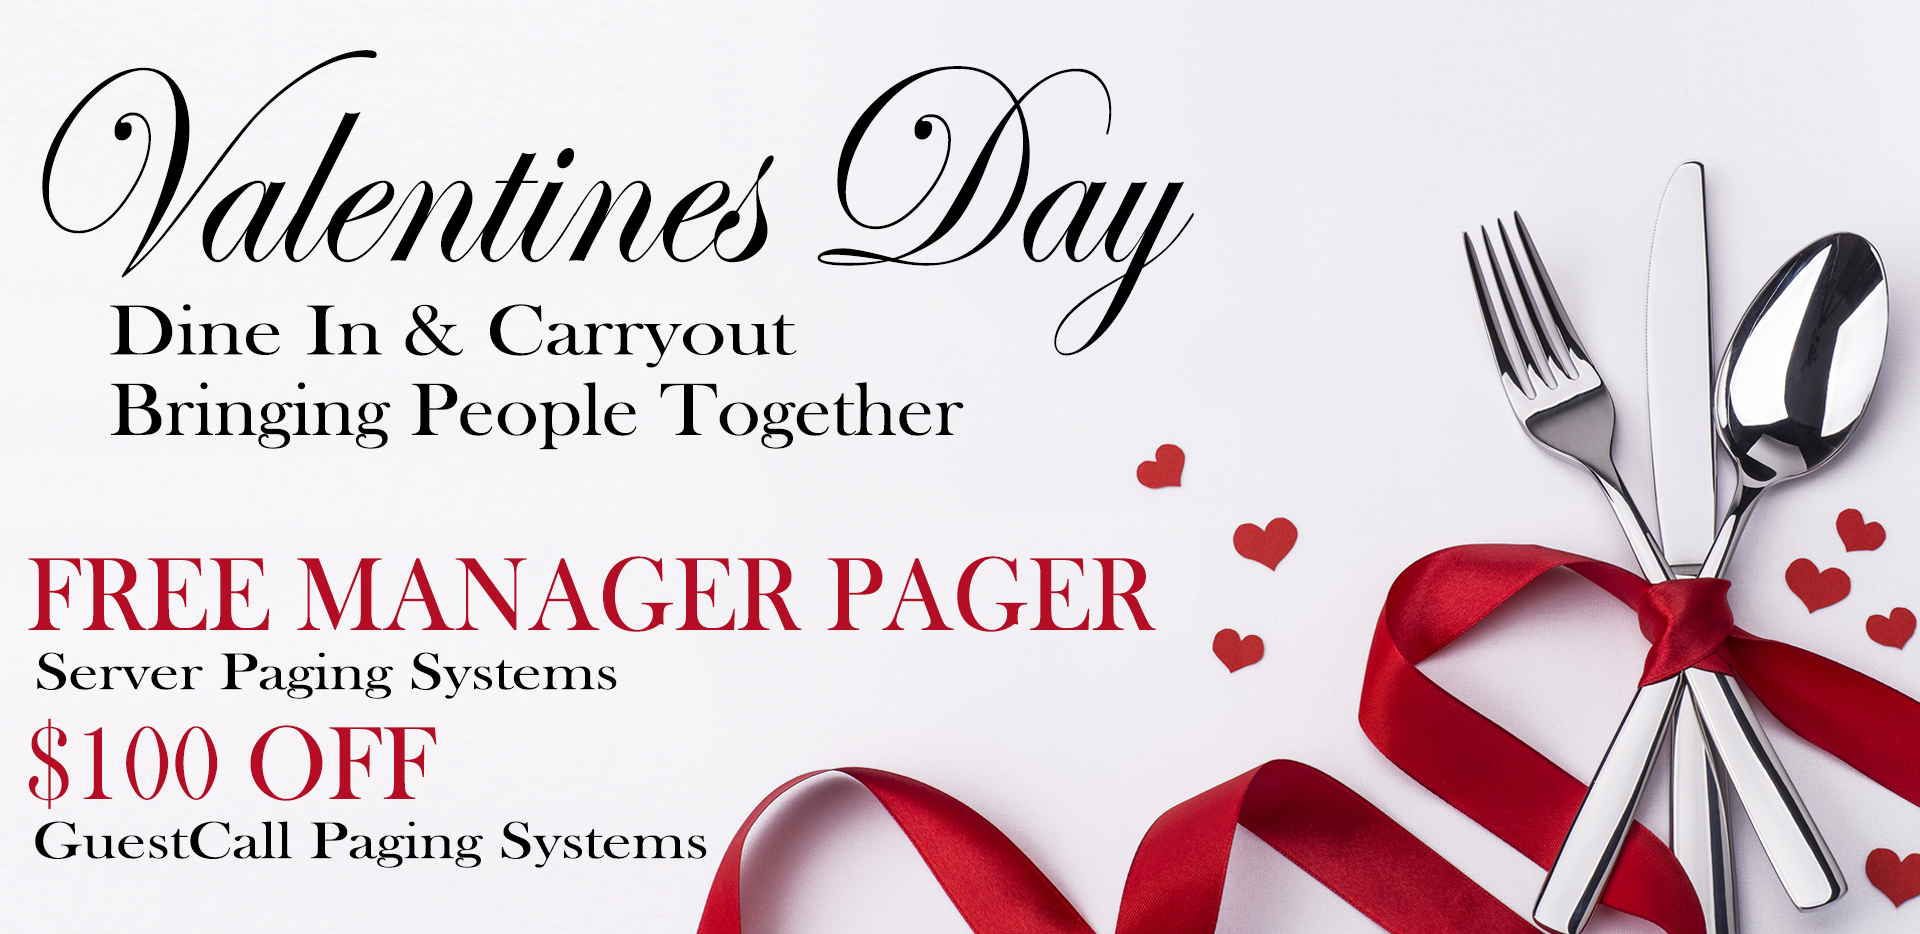 valentines-promo-2021-banner-server-staff-category.jpg